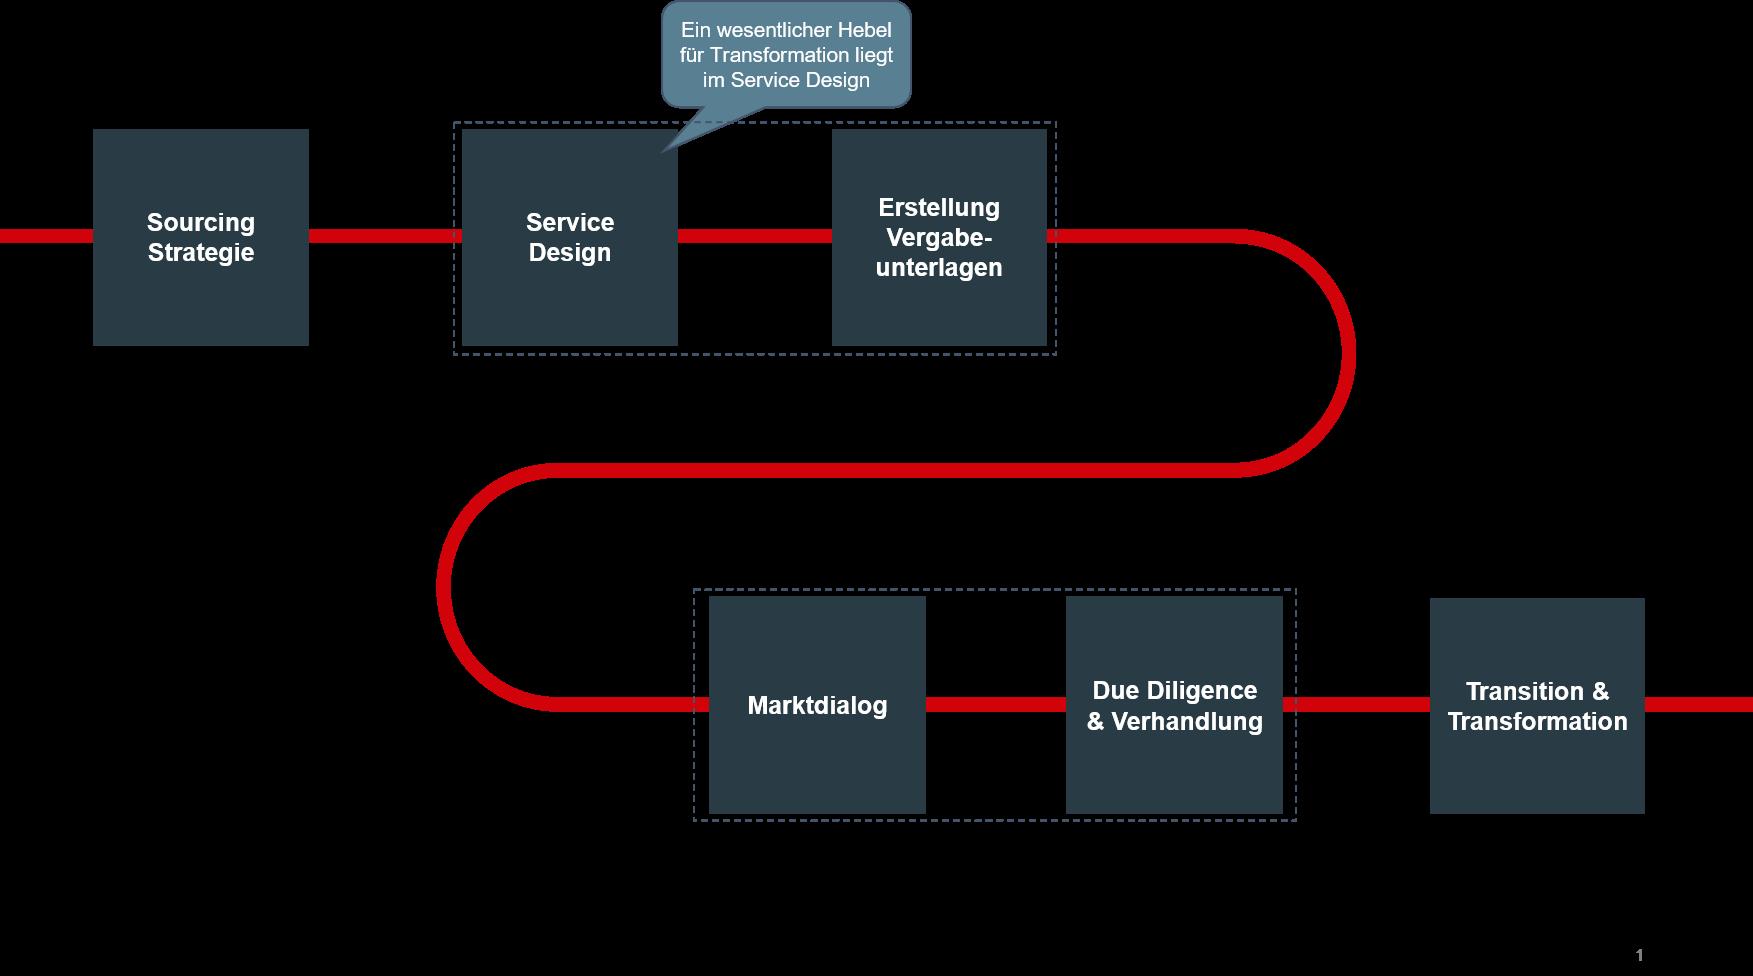 Strategisches IT-Sourcing